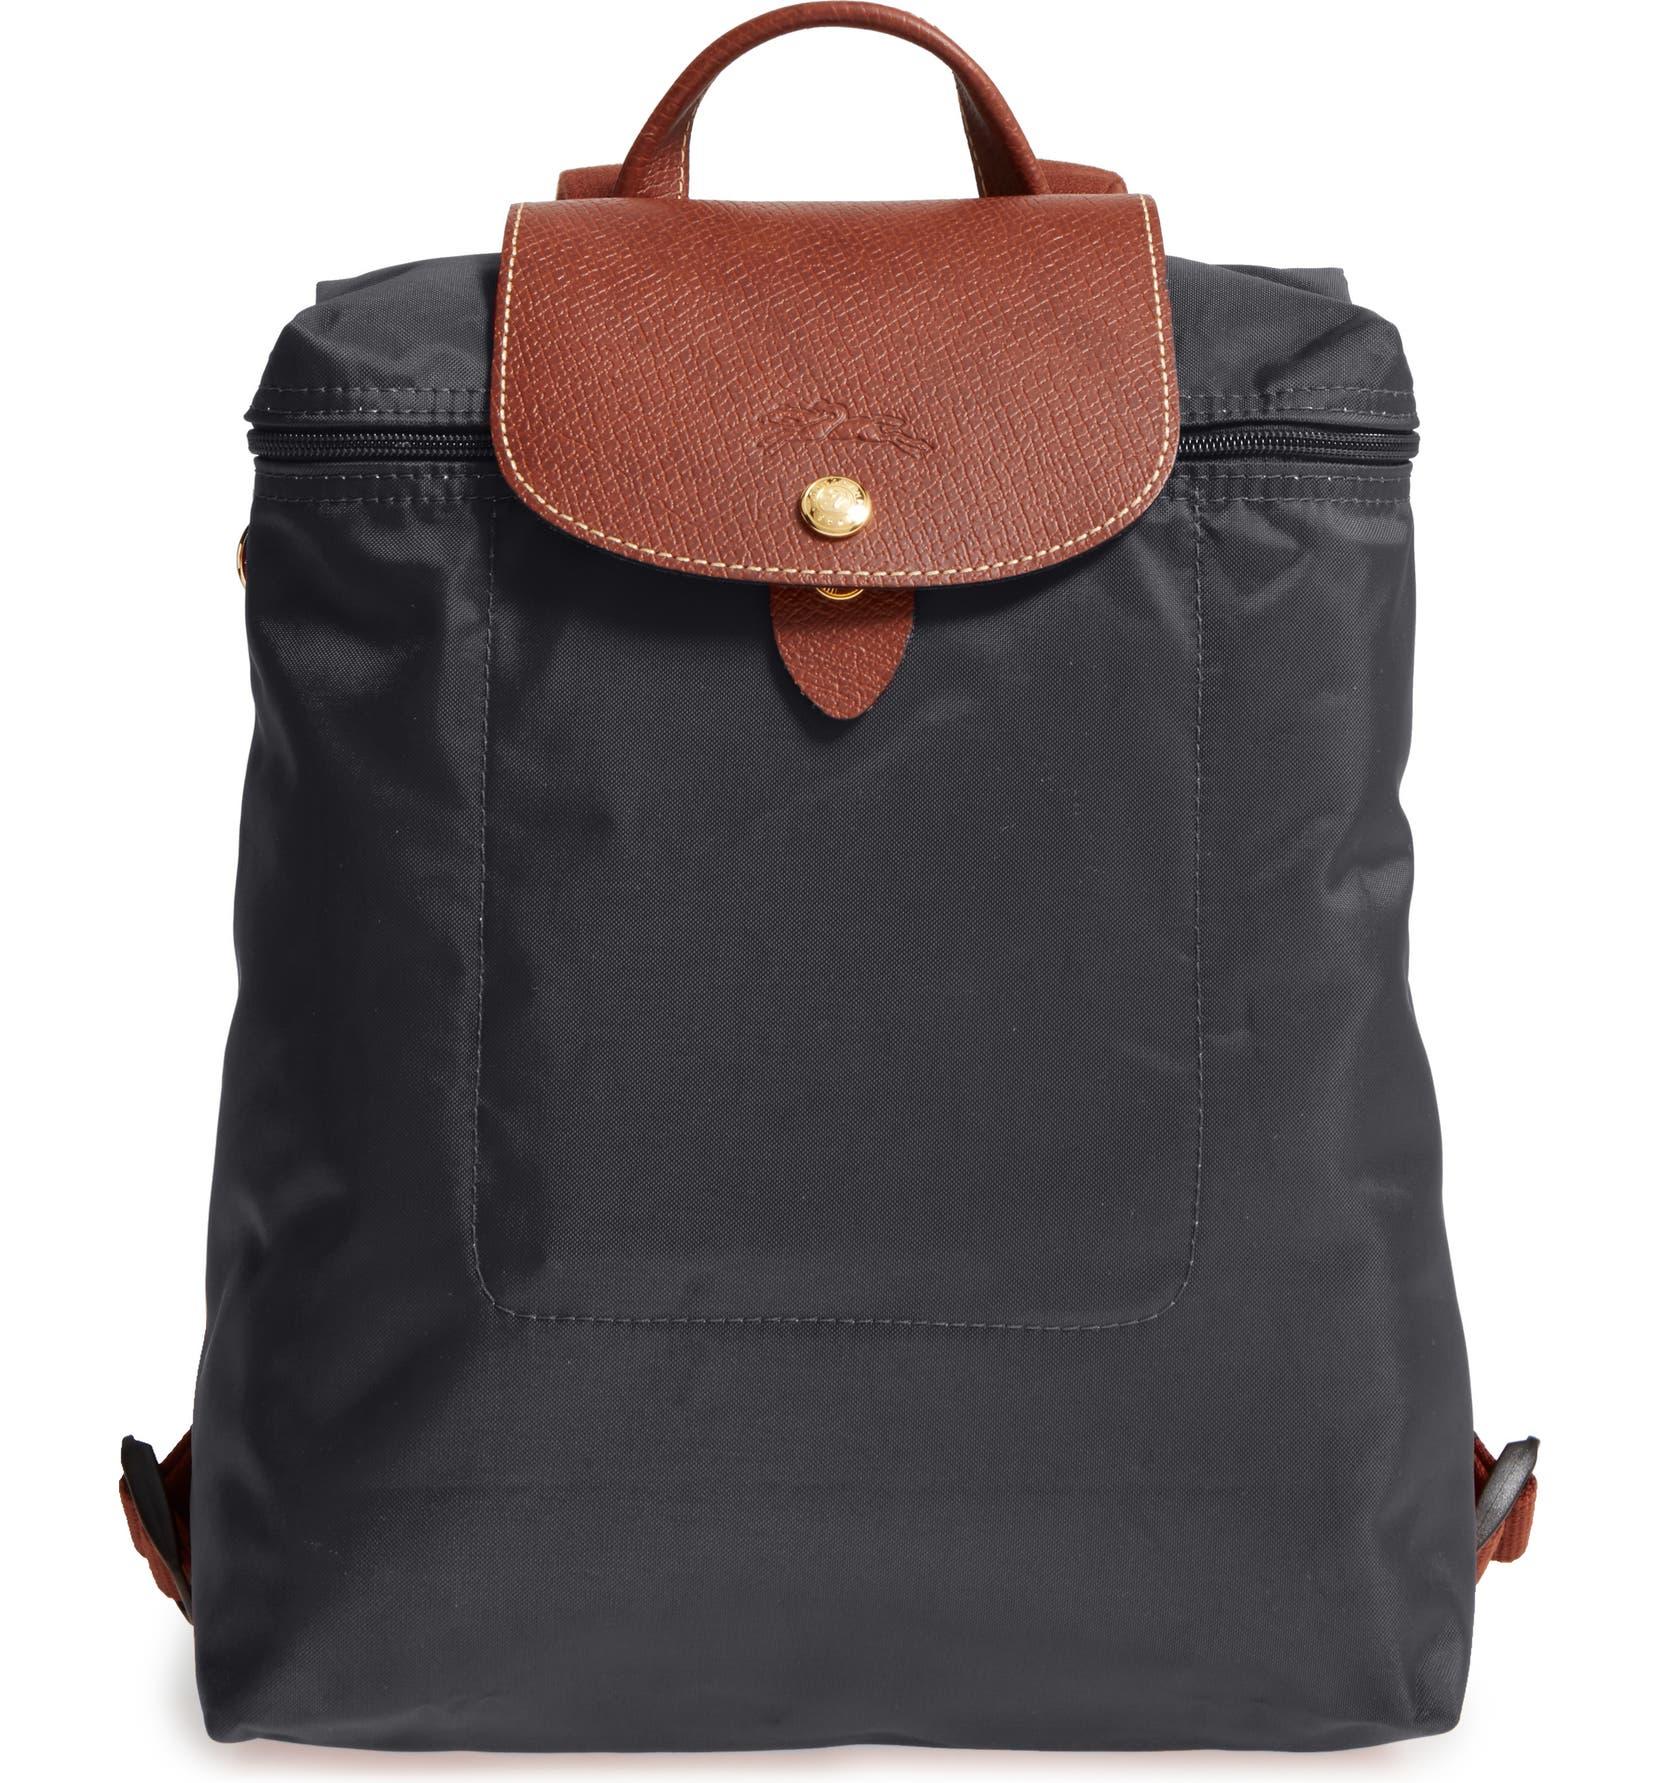 Longchamp  Le Pliage  Backpack  64679f1a5a51c